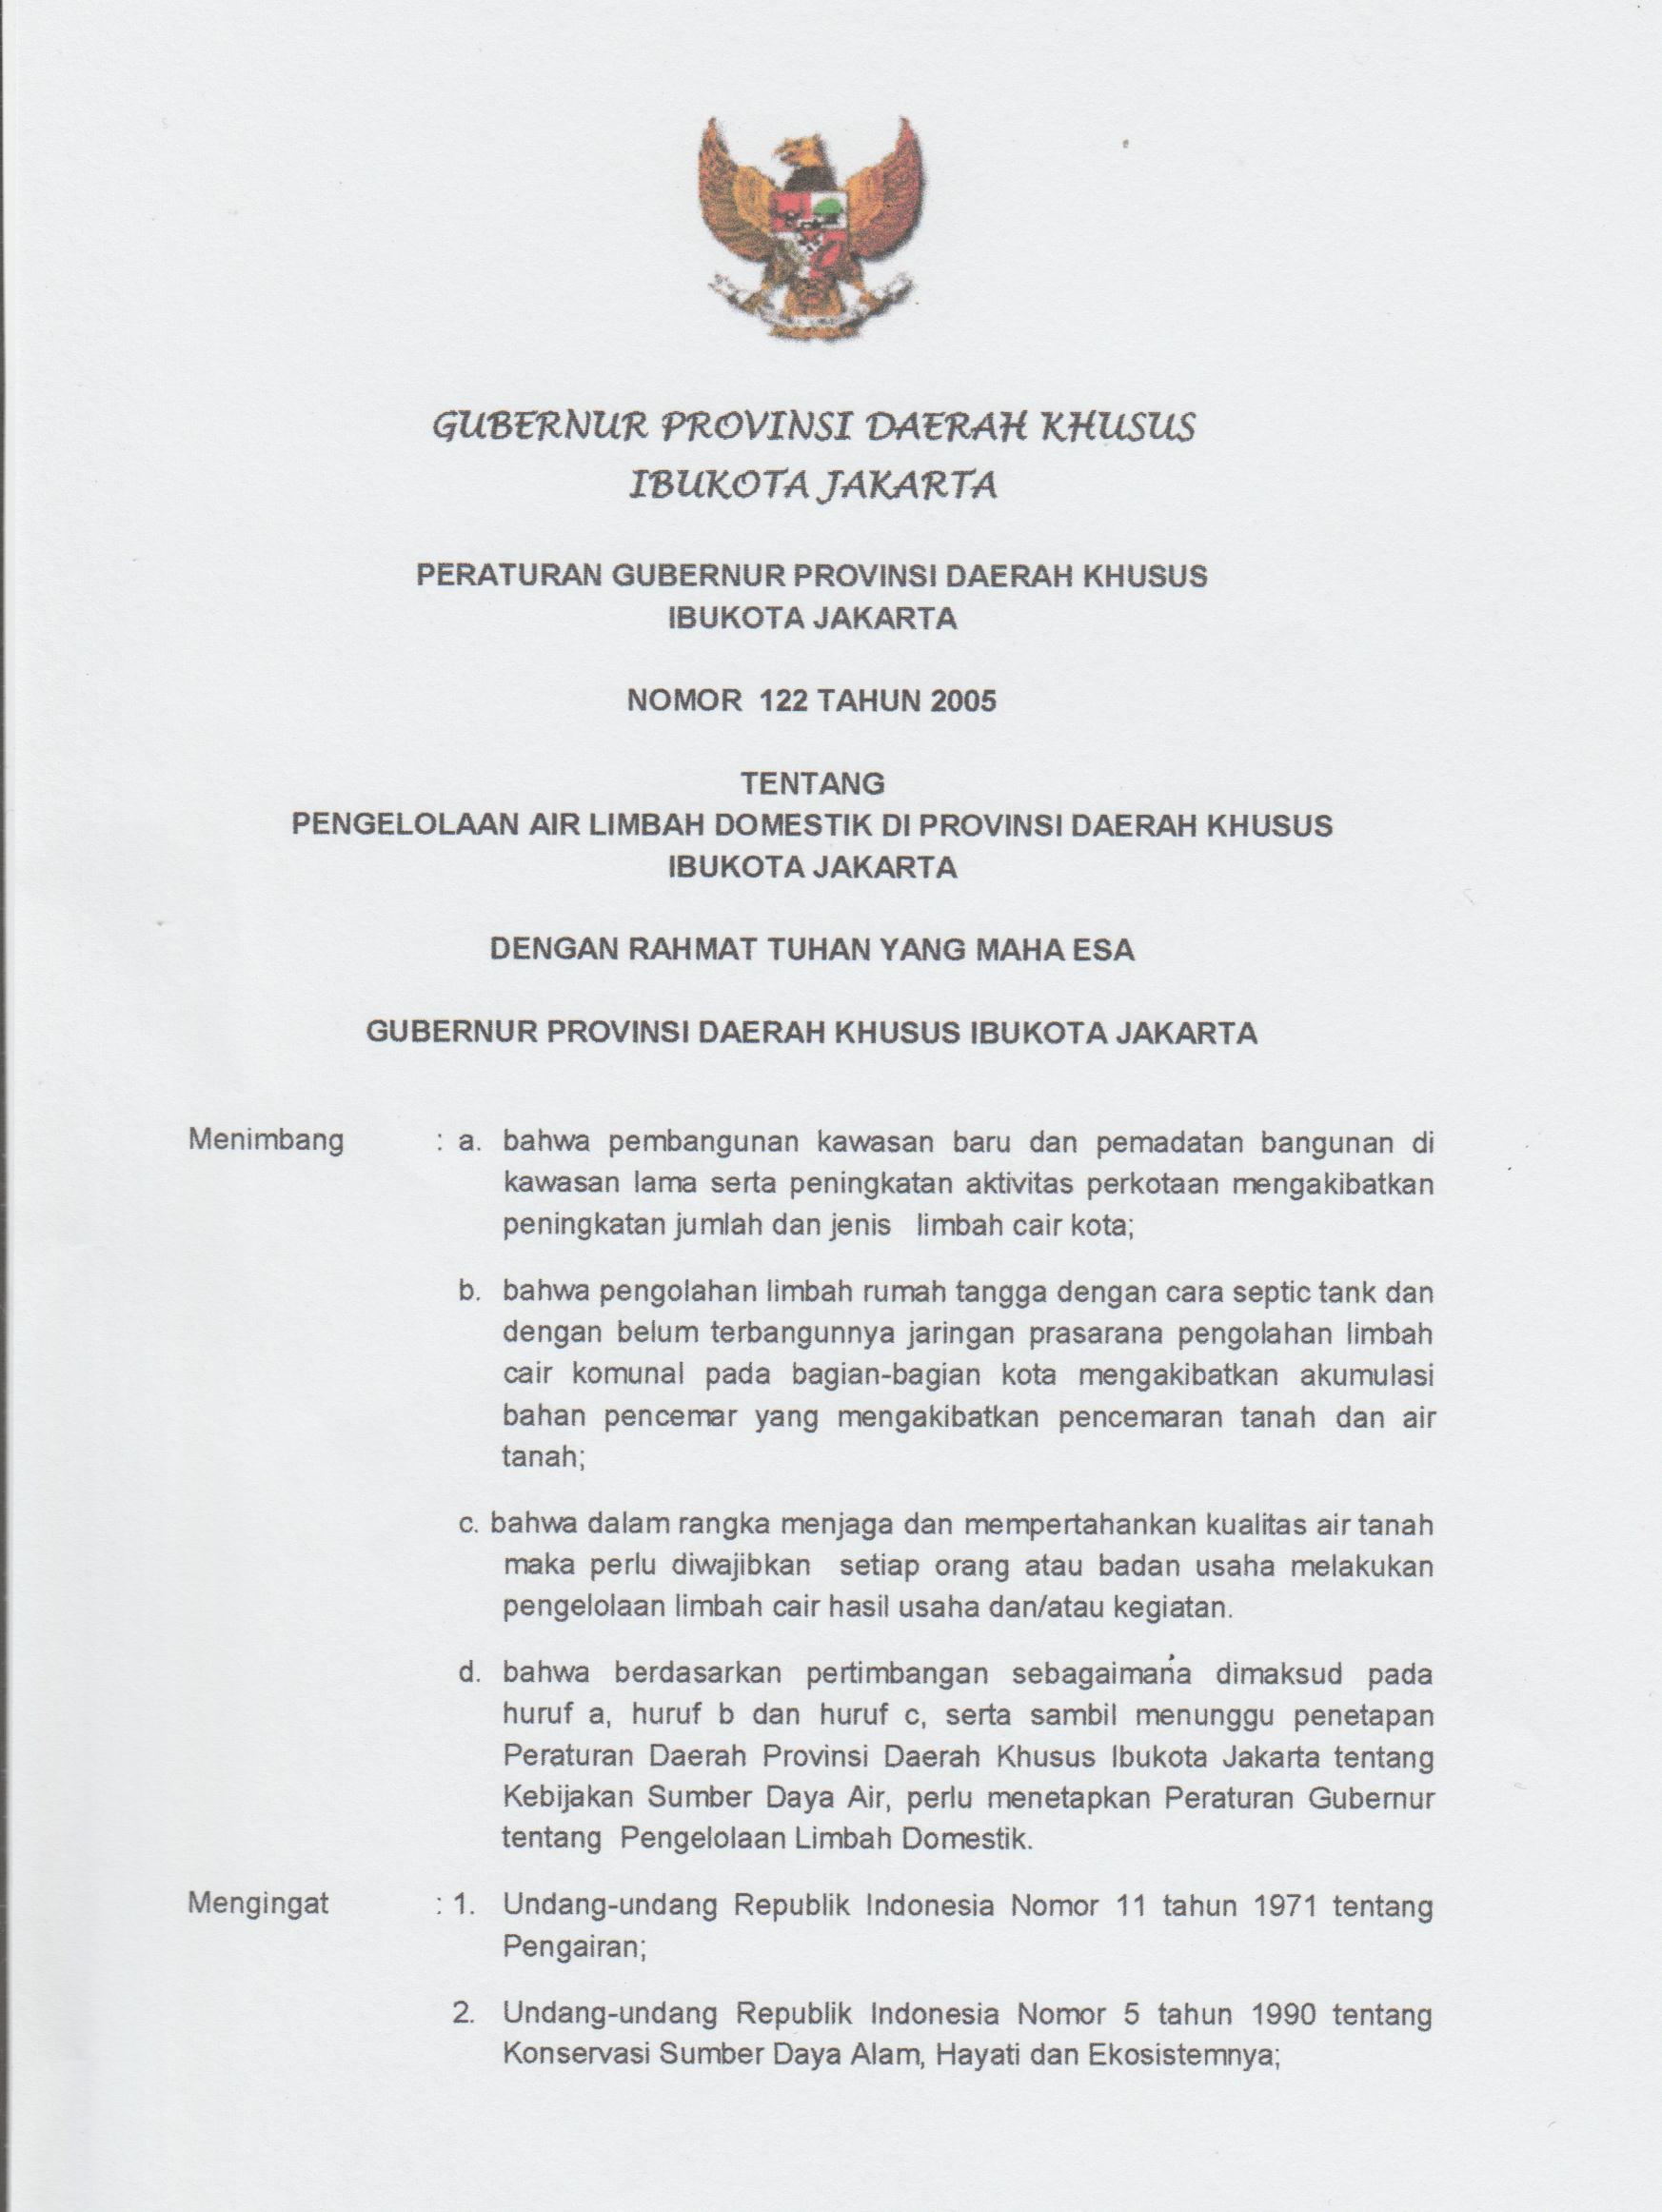 Peraturan Gubernur DKI Jakarta, Penggunaan Septic Tank